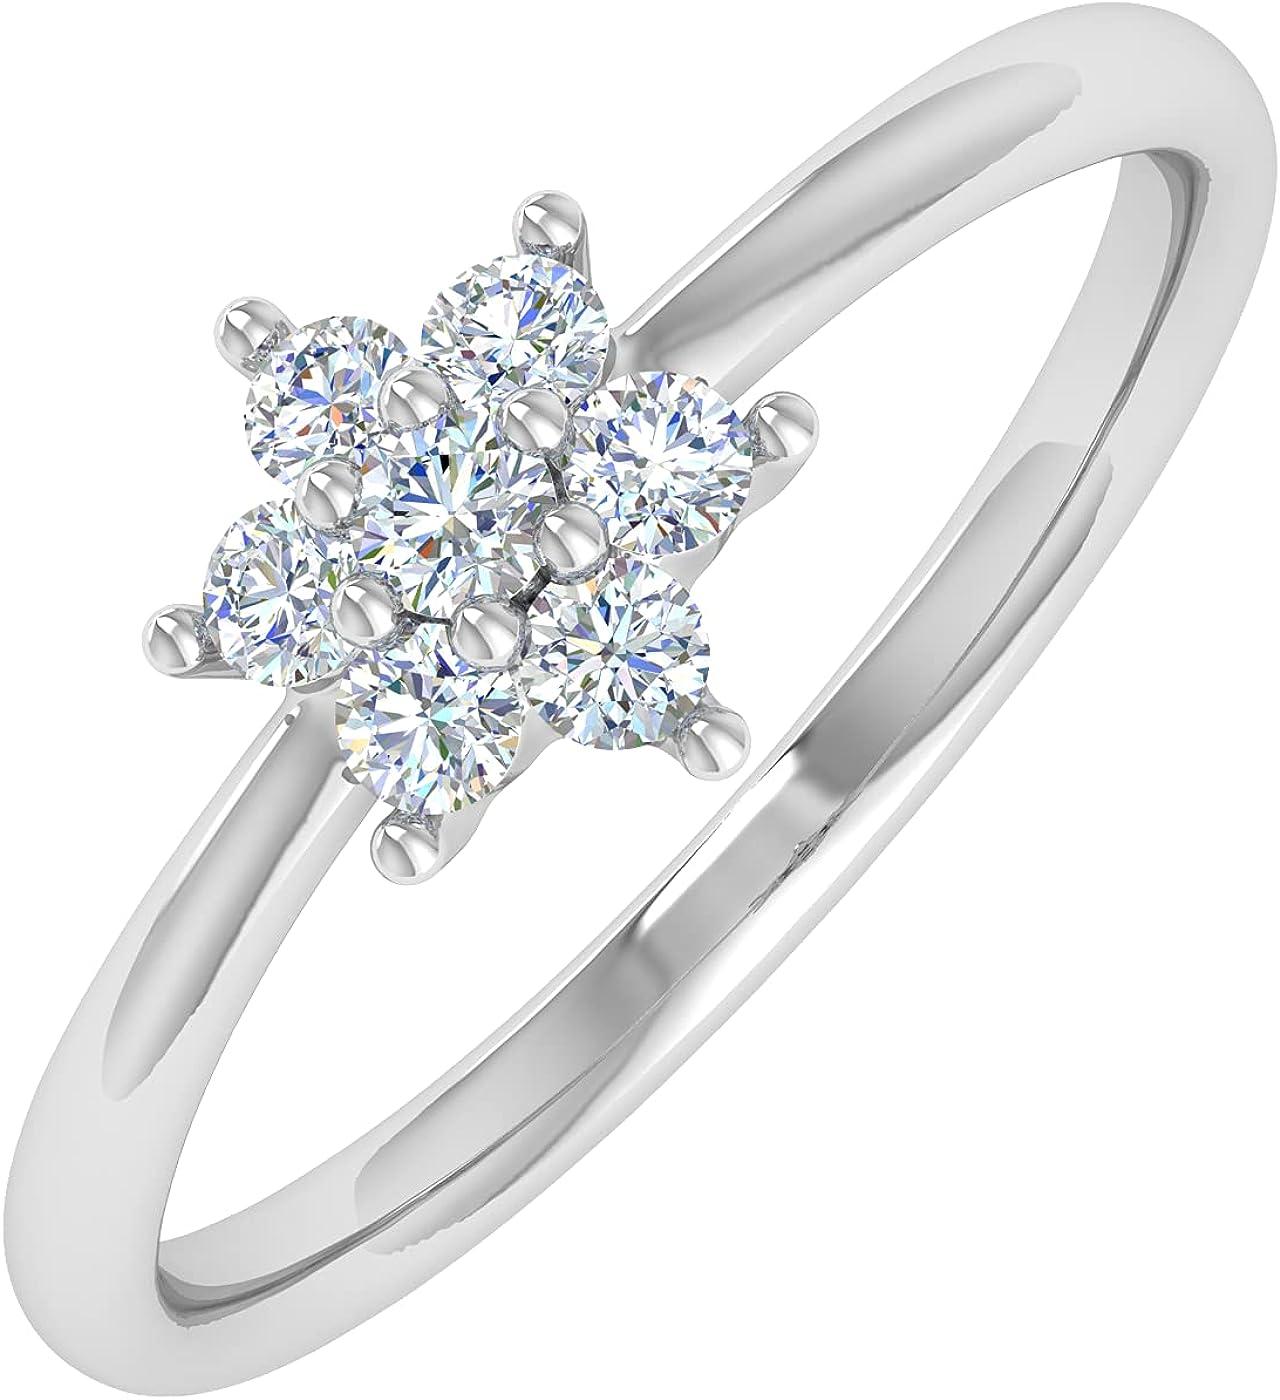 0.15 Carat Prong Set Diamond Cluster Ring Band in 14K Gold